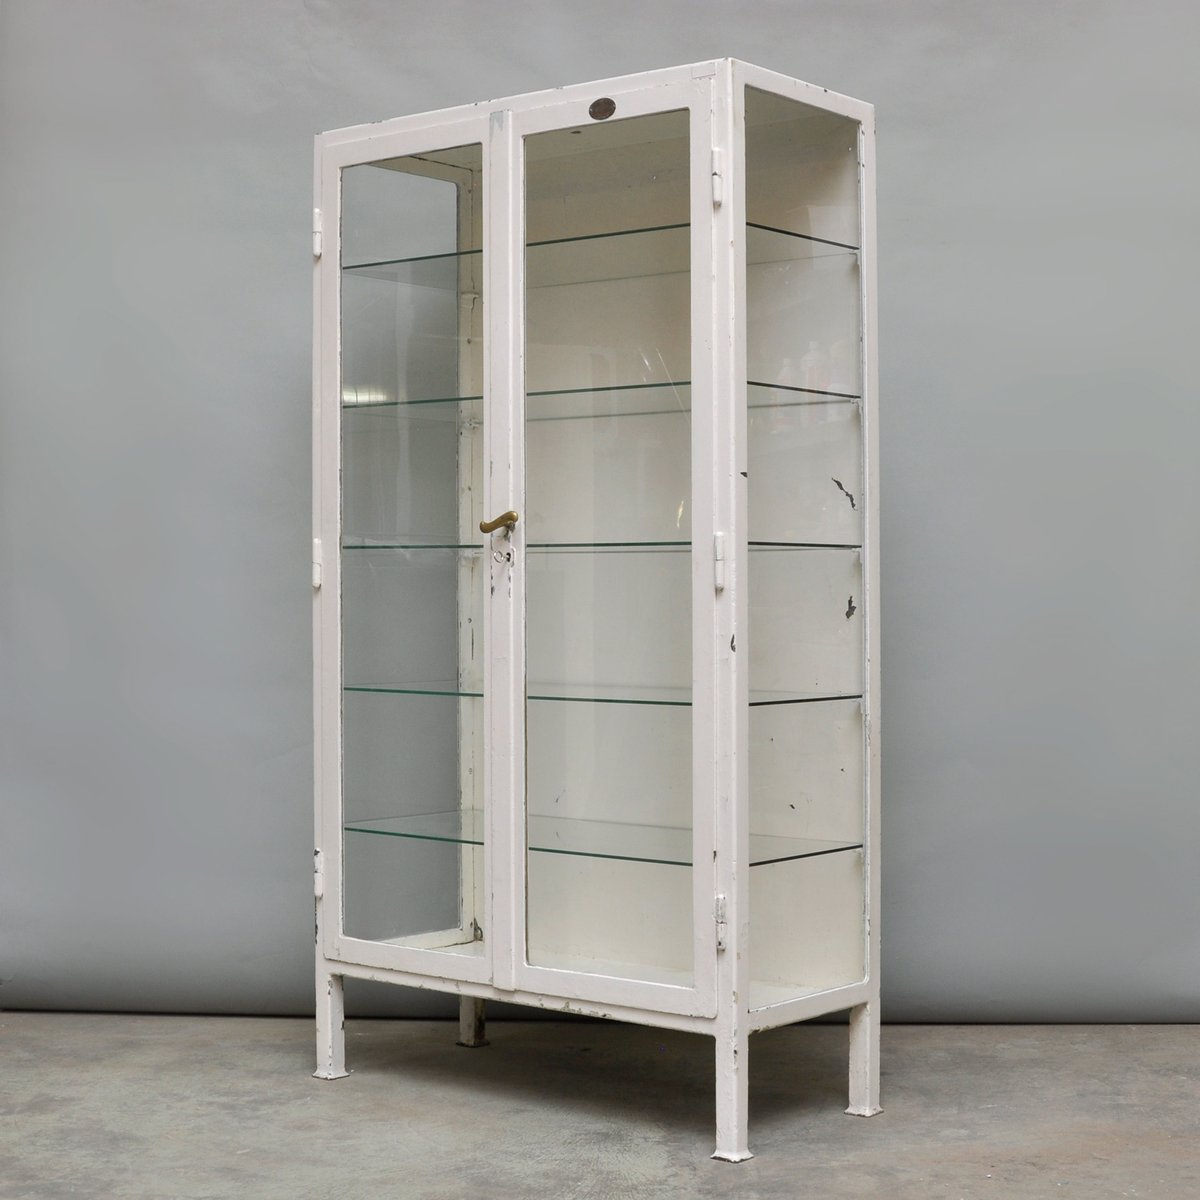 Vintage Steel And Glass Medicine Cabinet, 1930s